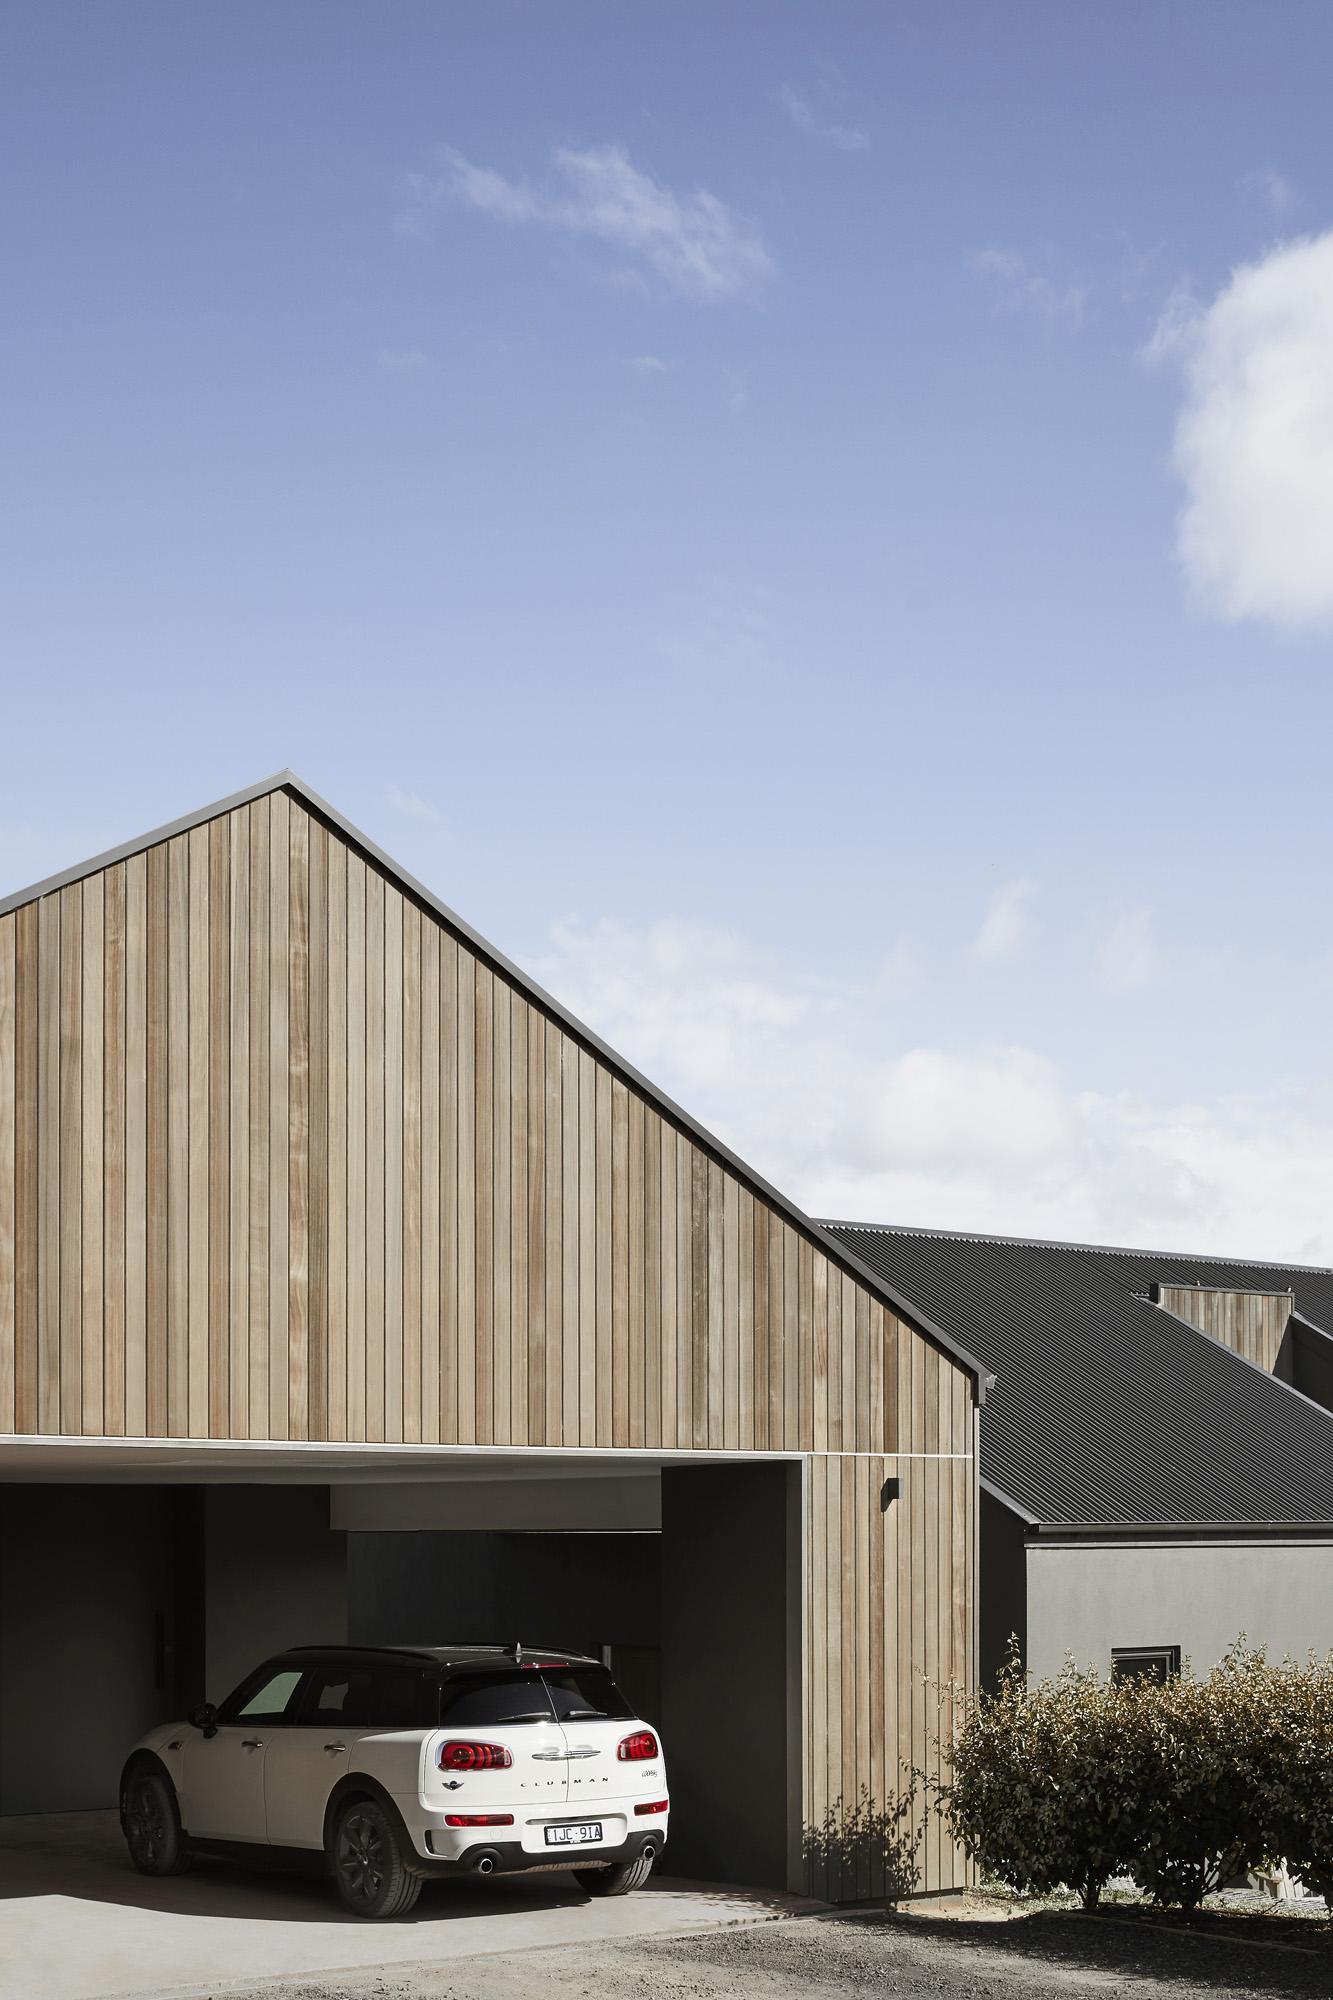 Dan Gayfer Design - MINI Australia - Feature Intervew - Australian Architecture - Ceres House, Victoria - Image 15